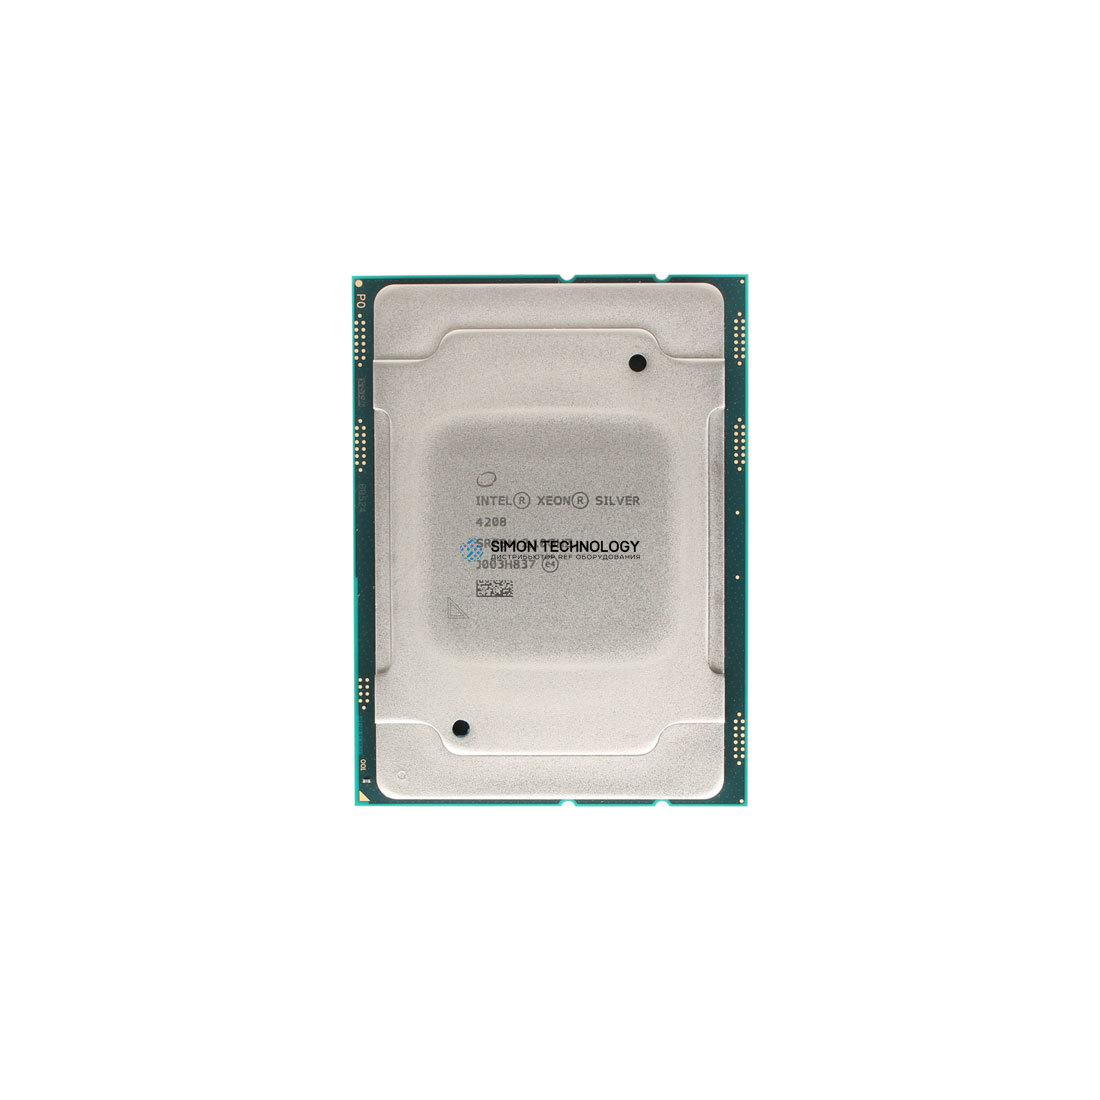 Процессор HP Enterprise Intel Xeon Silver 4208 - 2.1 GHz - 8 Kerne - 16 Threads New (P02571-B21)